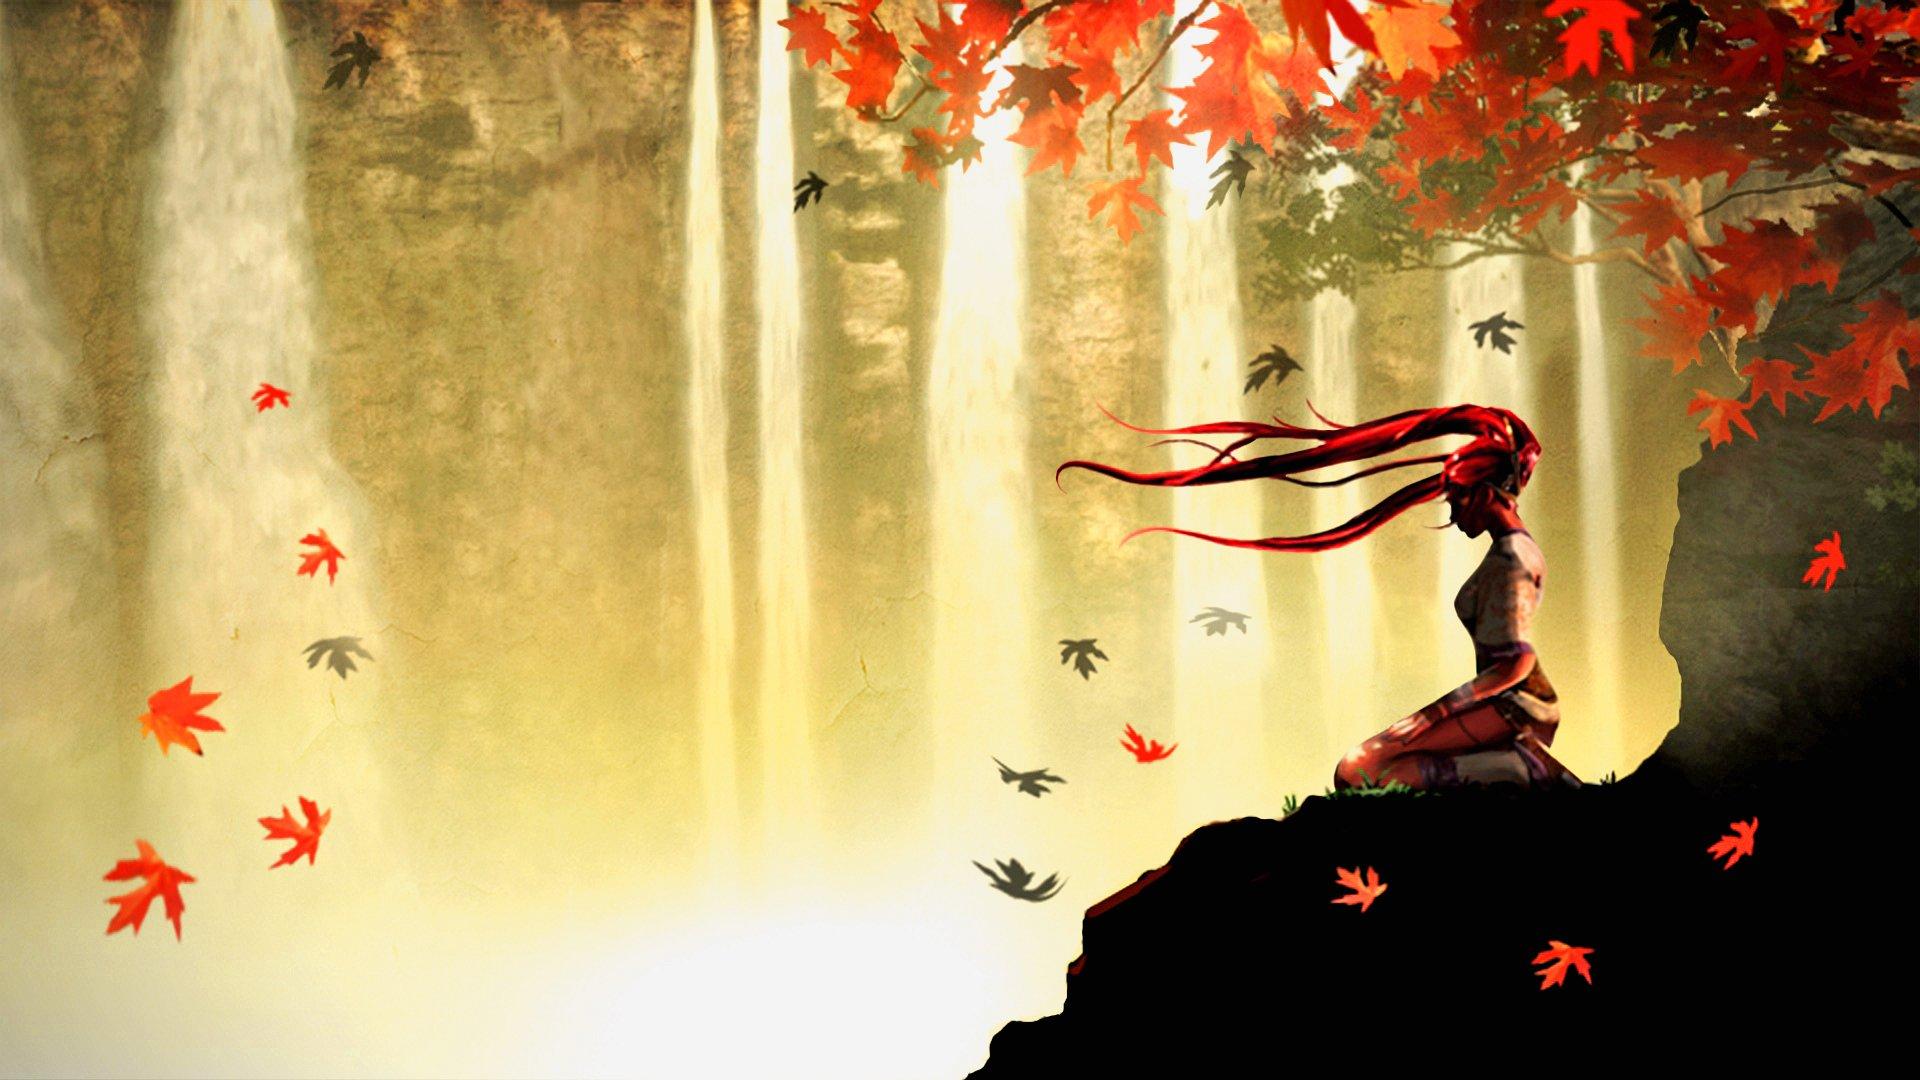 Anime Fall Wallpapers Wallpapersafari